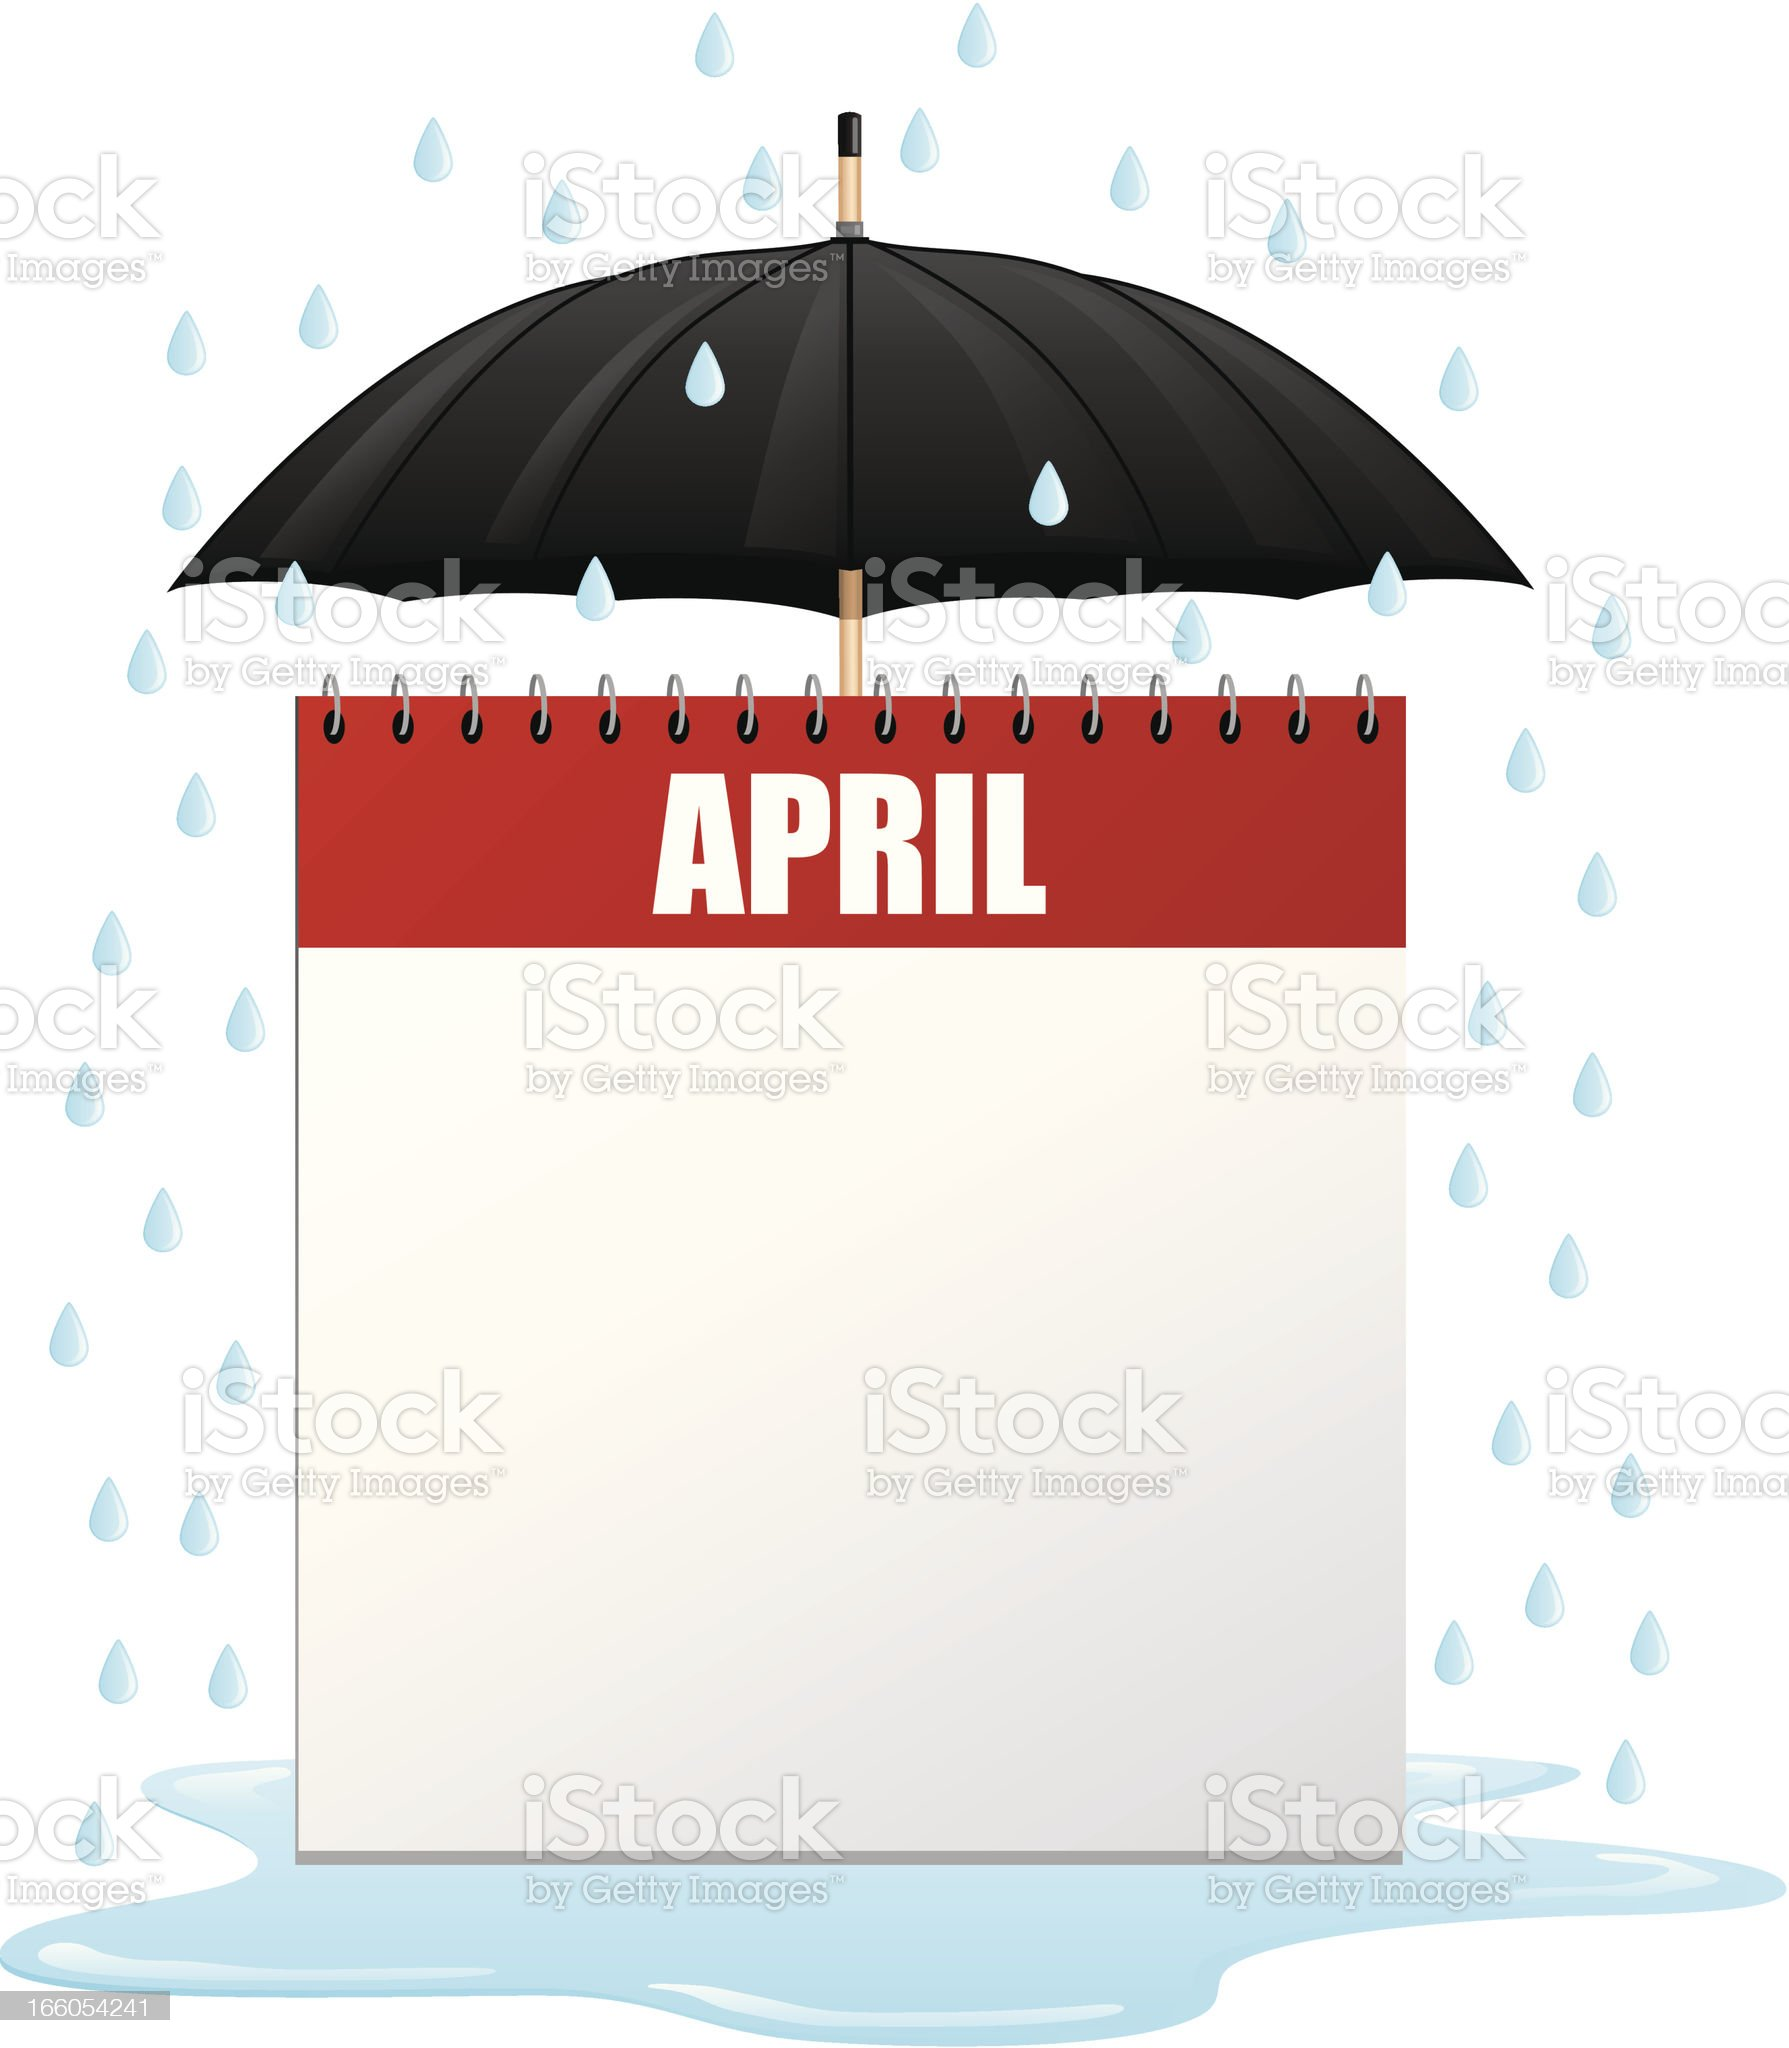 April Showers Calendar royalty-free stock vector art